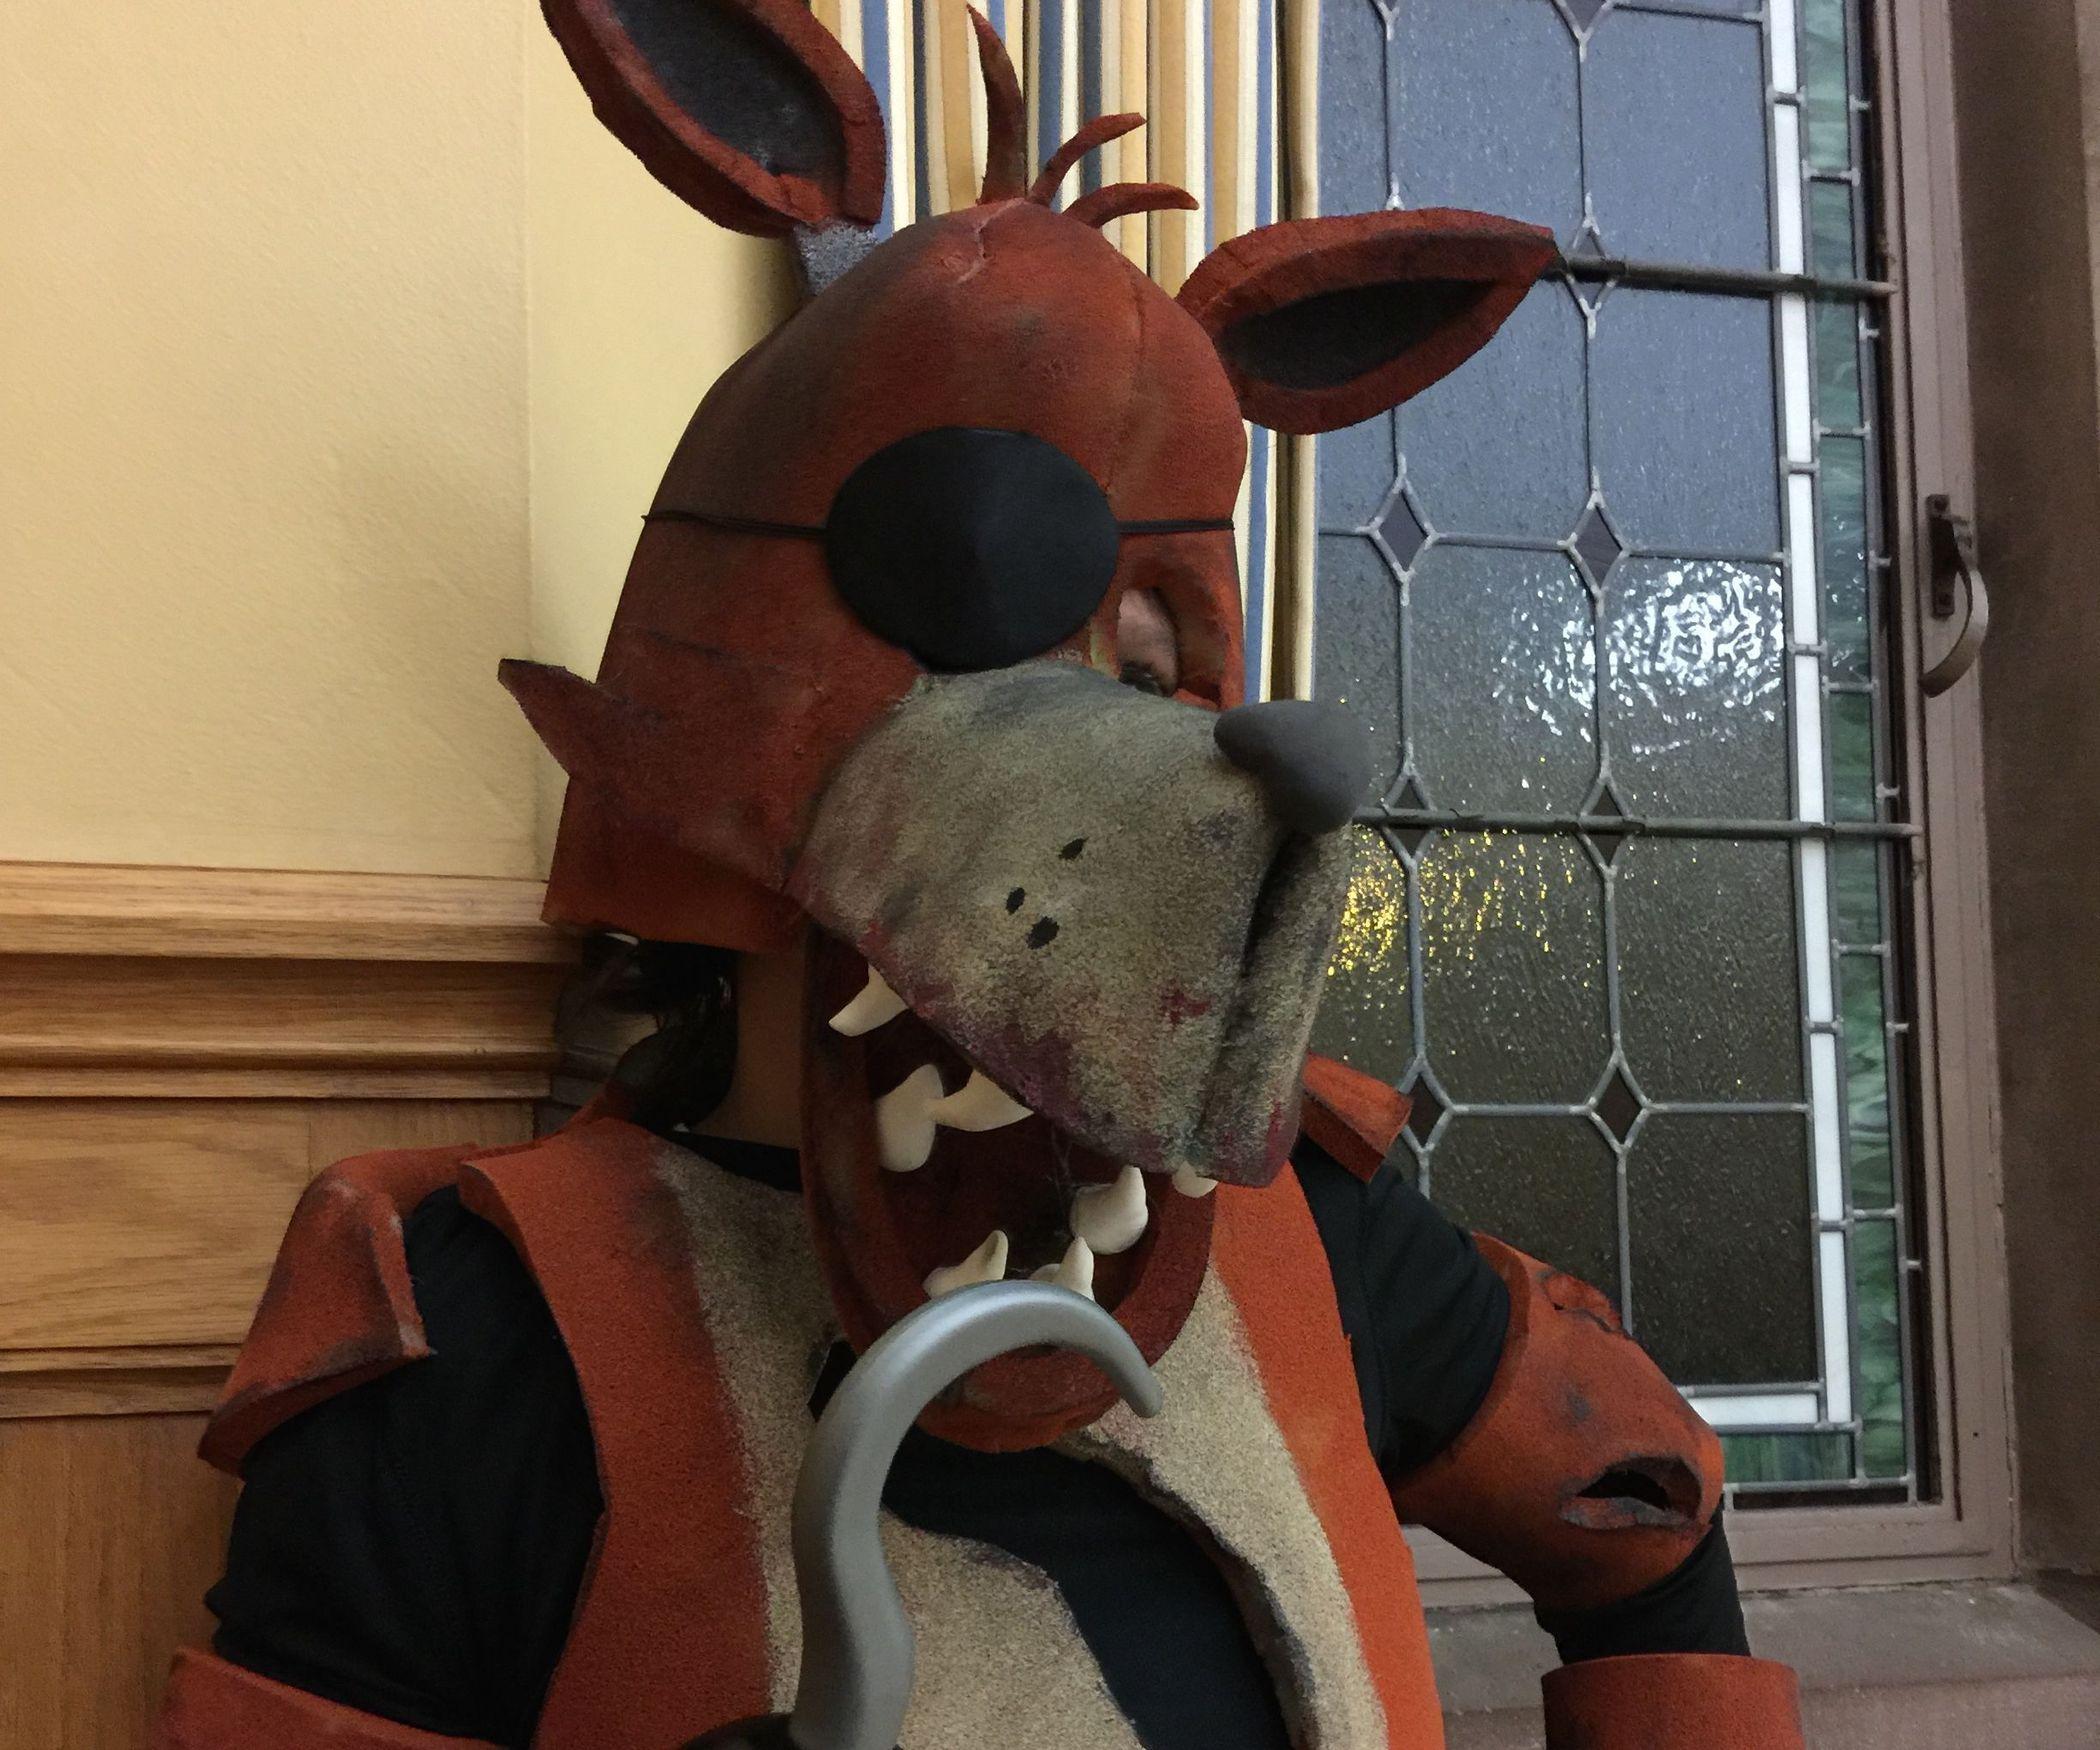 F fnaf bonnie costume for sale - Costumes